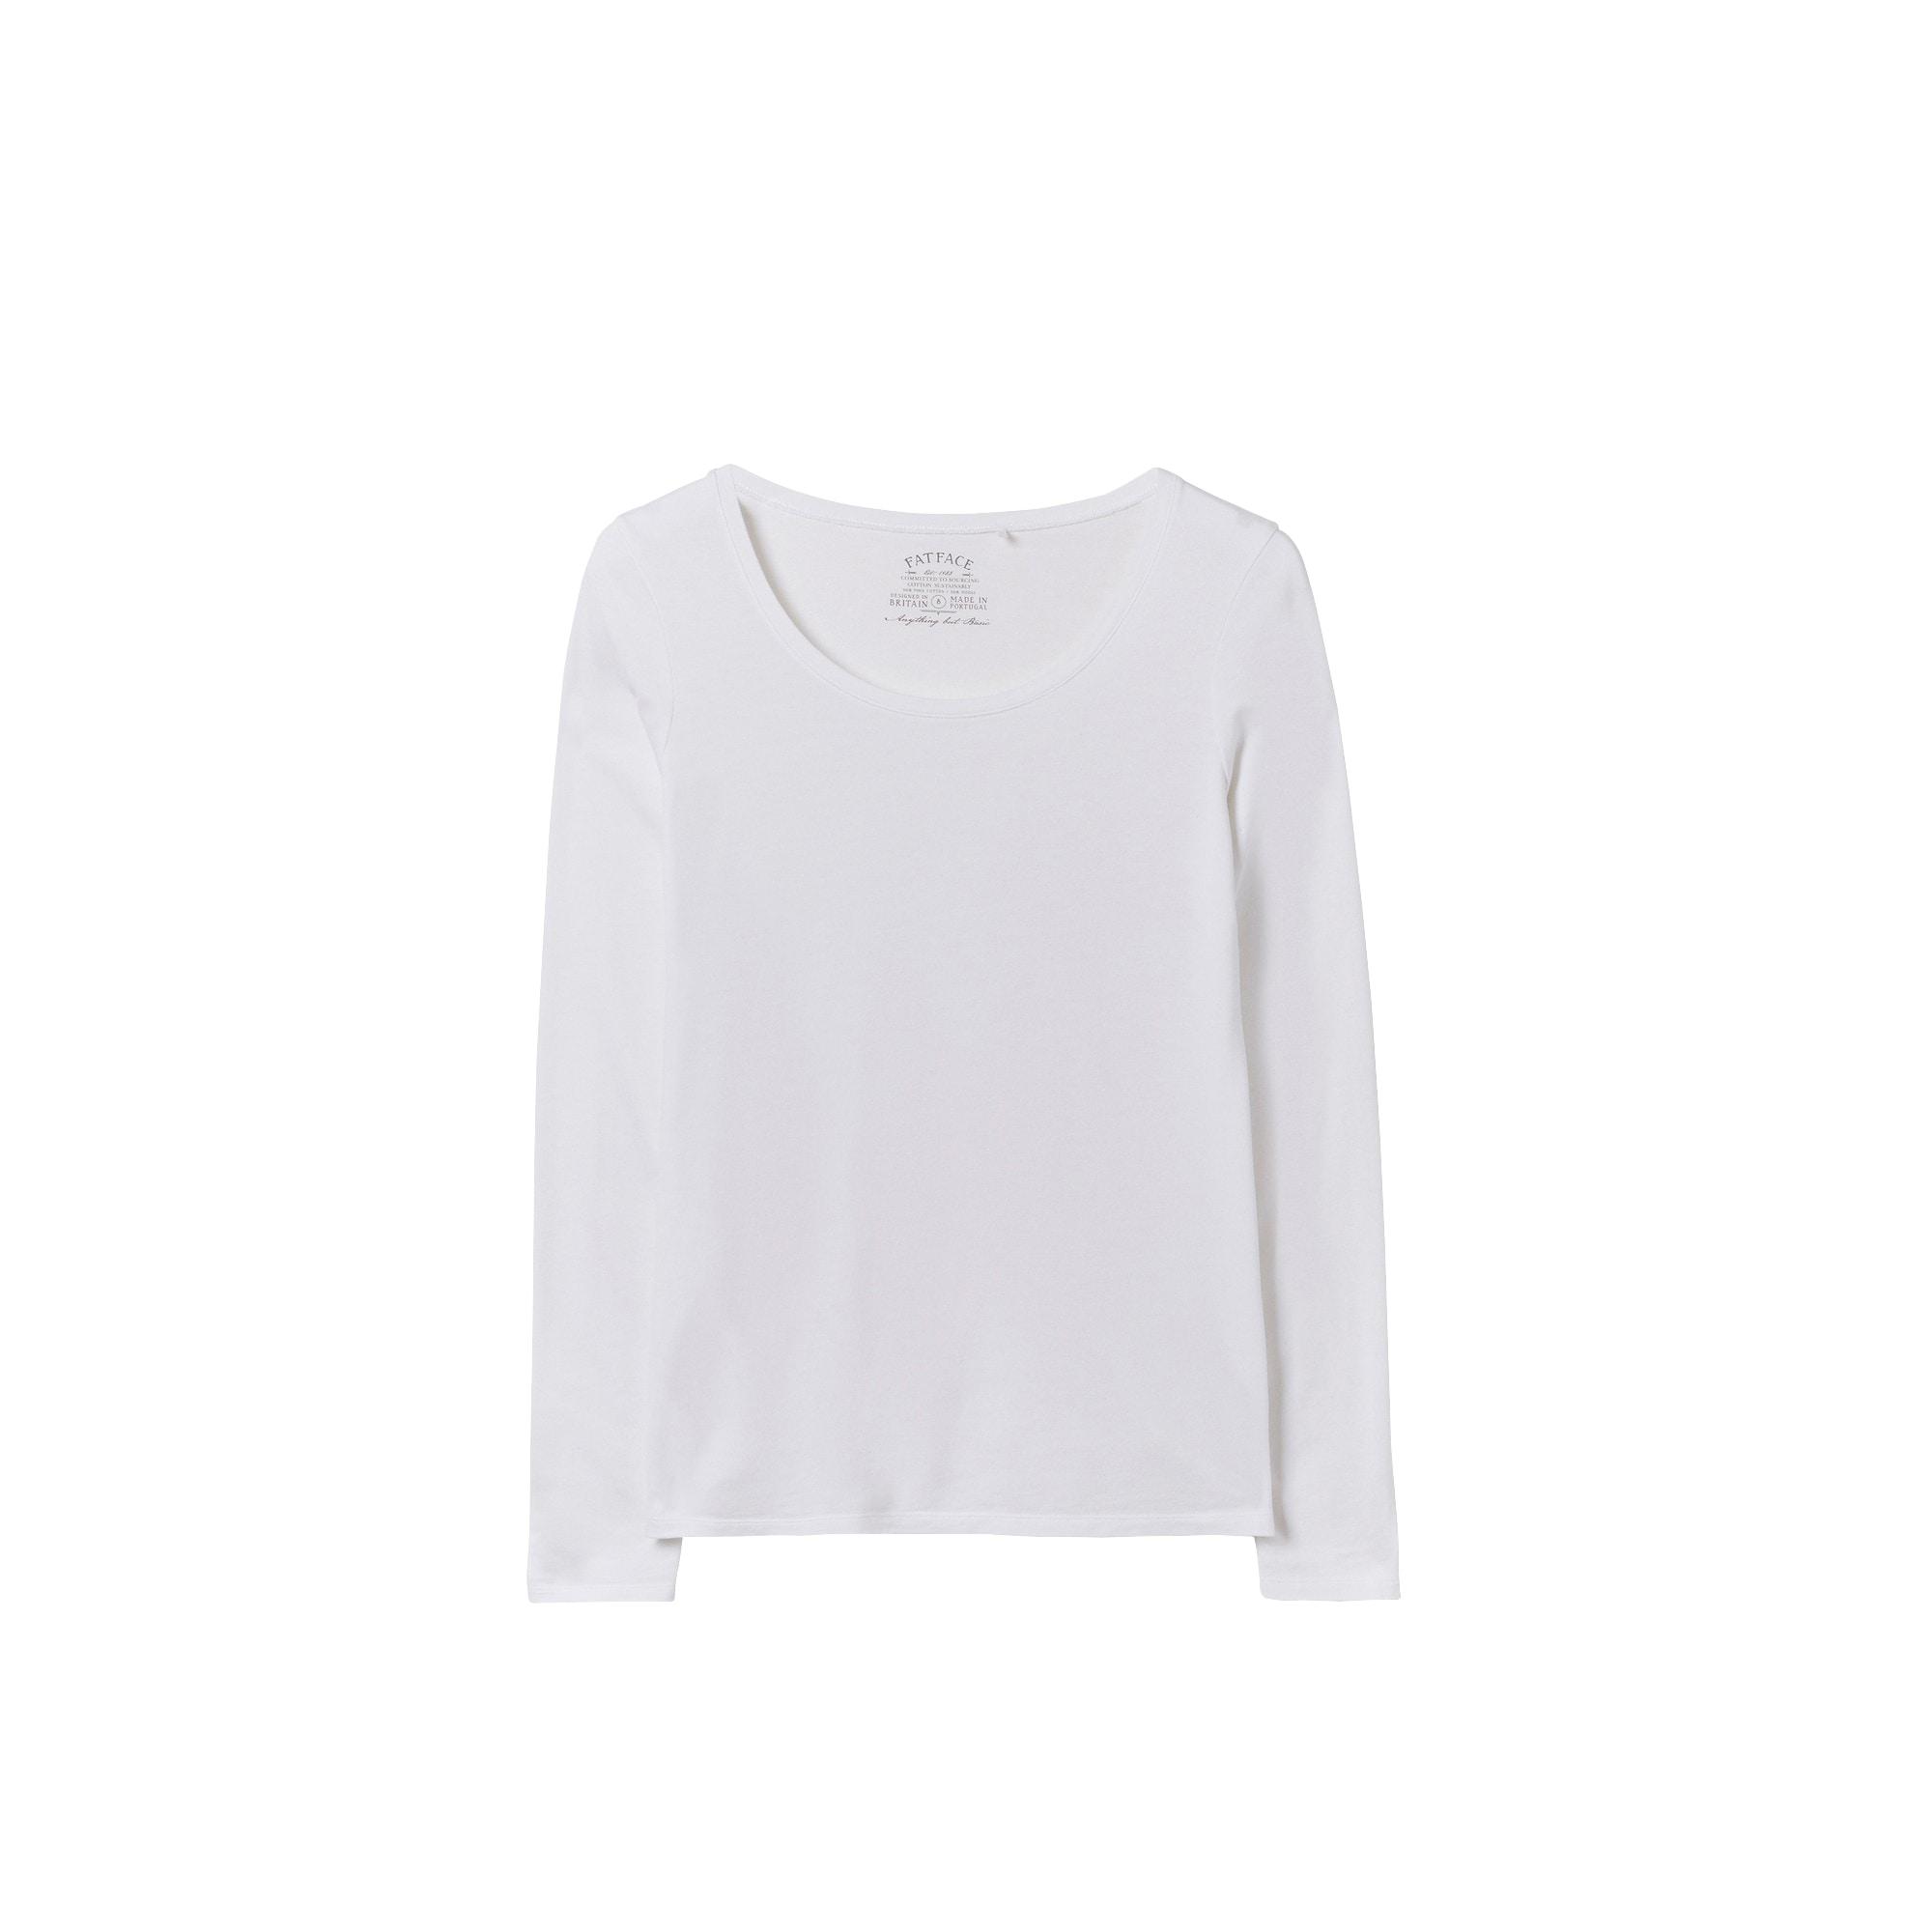 Funktionsshirt f/ür Crossfit SMMASH Paradiso Damen Langarm Top Yoga Sport Langarmshirt Fitness Atmungsaktiv und Leicht Compression Shirt Hergestellt in der EU Gym Top Longsleeve Damen